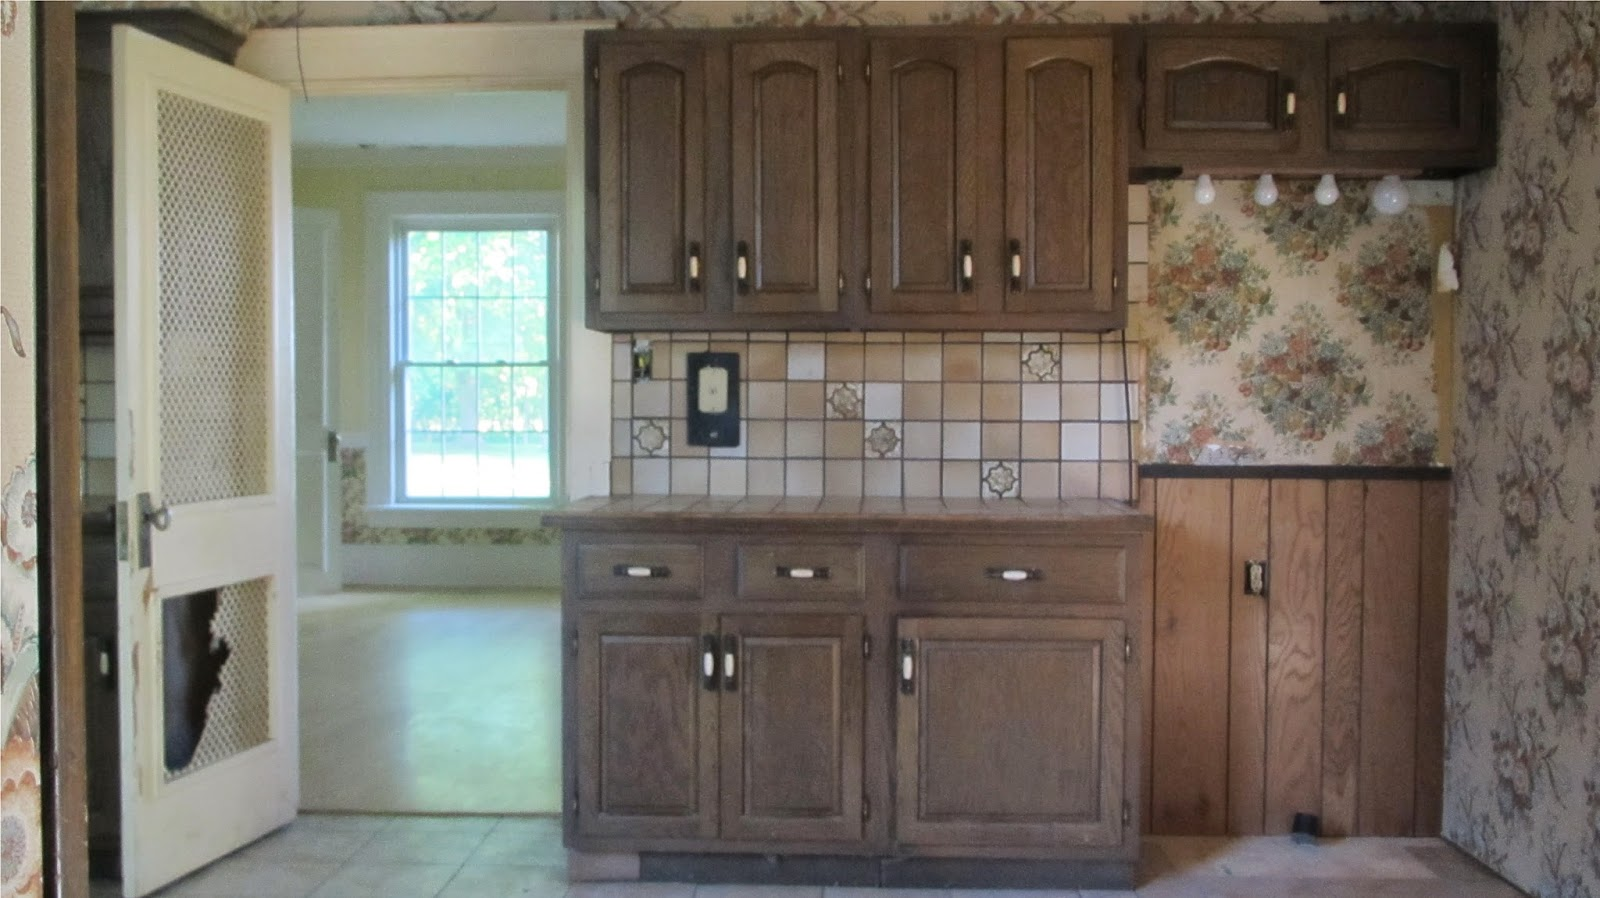 pass through kitchen window epoxy resin countertops kammy 39s korner quotpass quot restoring